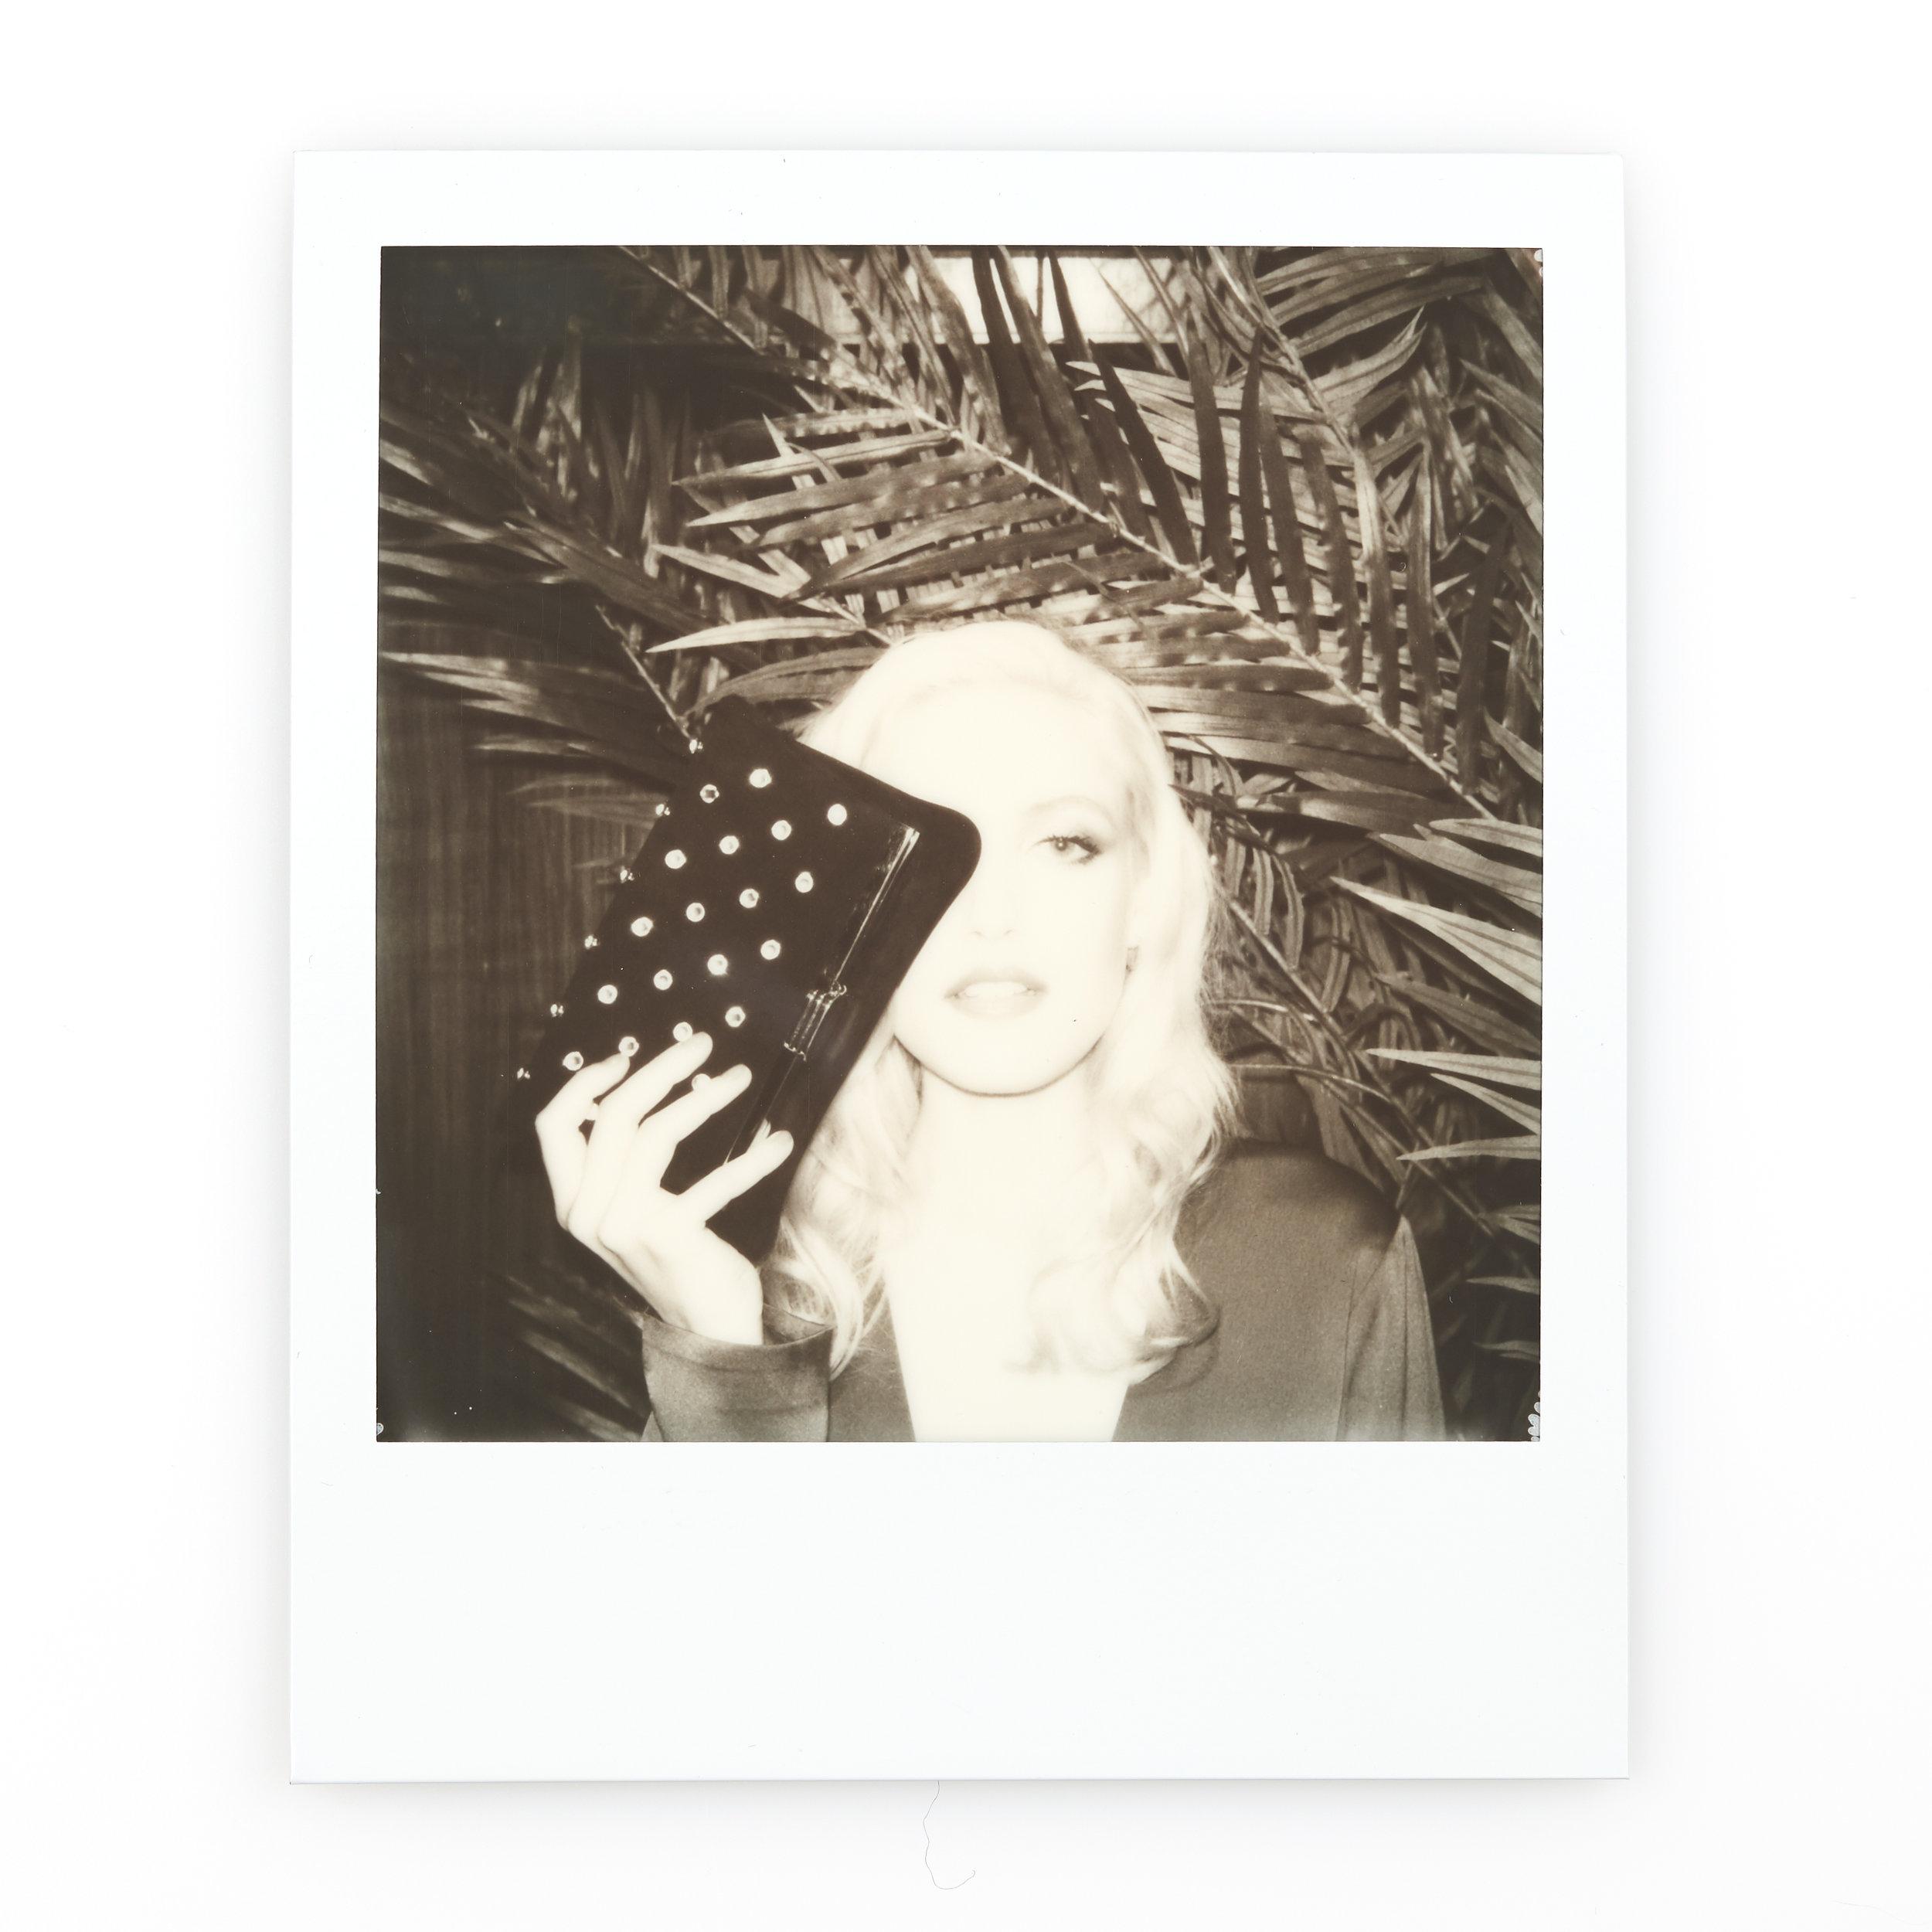 CB_BD_Polaroids_2017_002.jpg